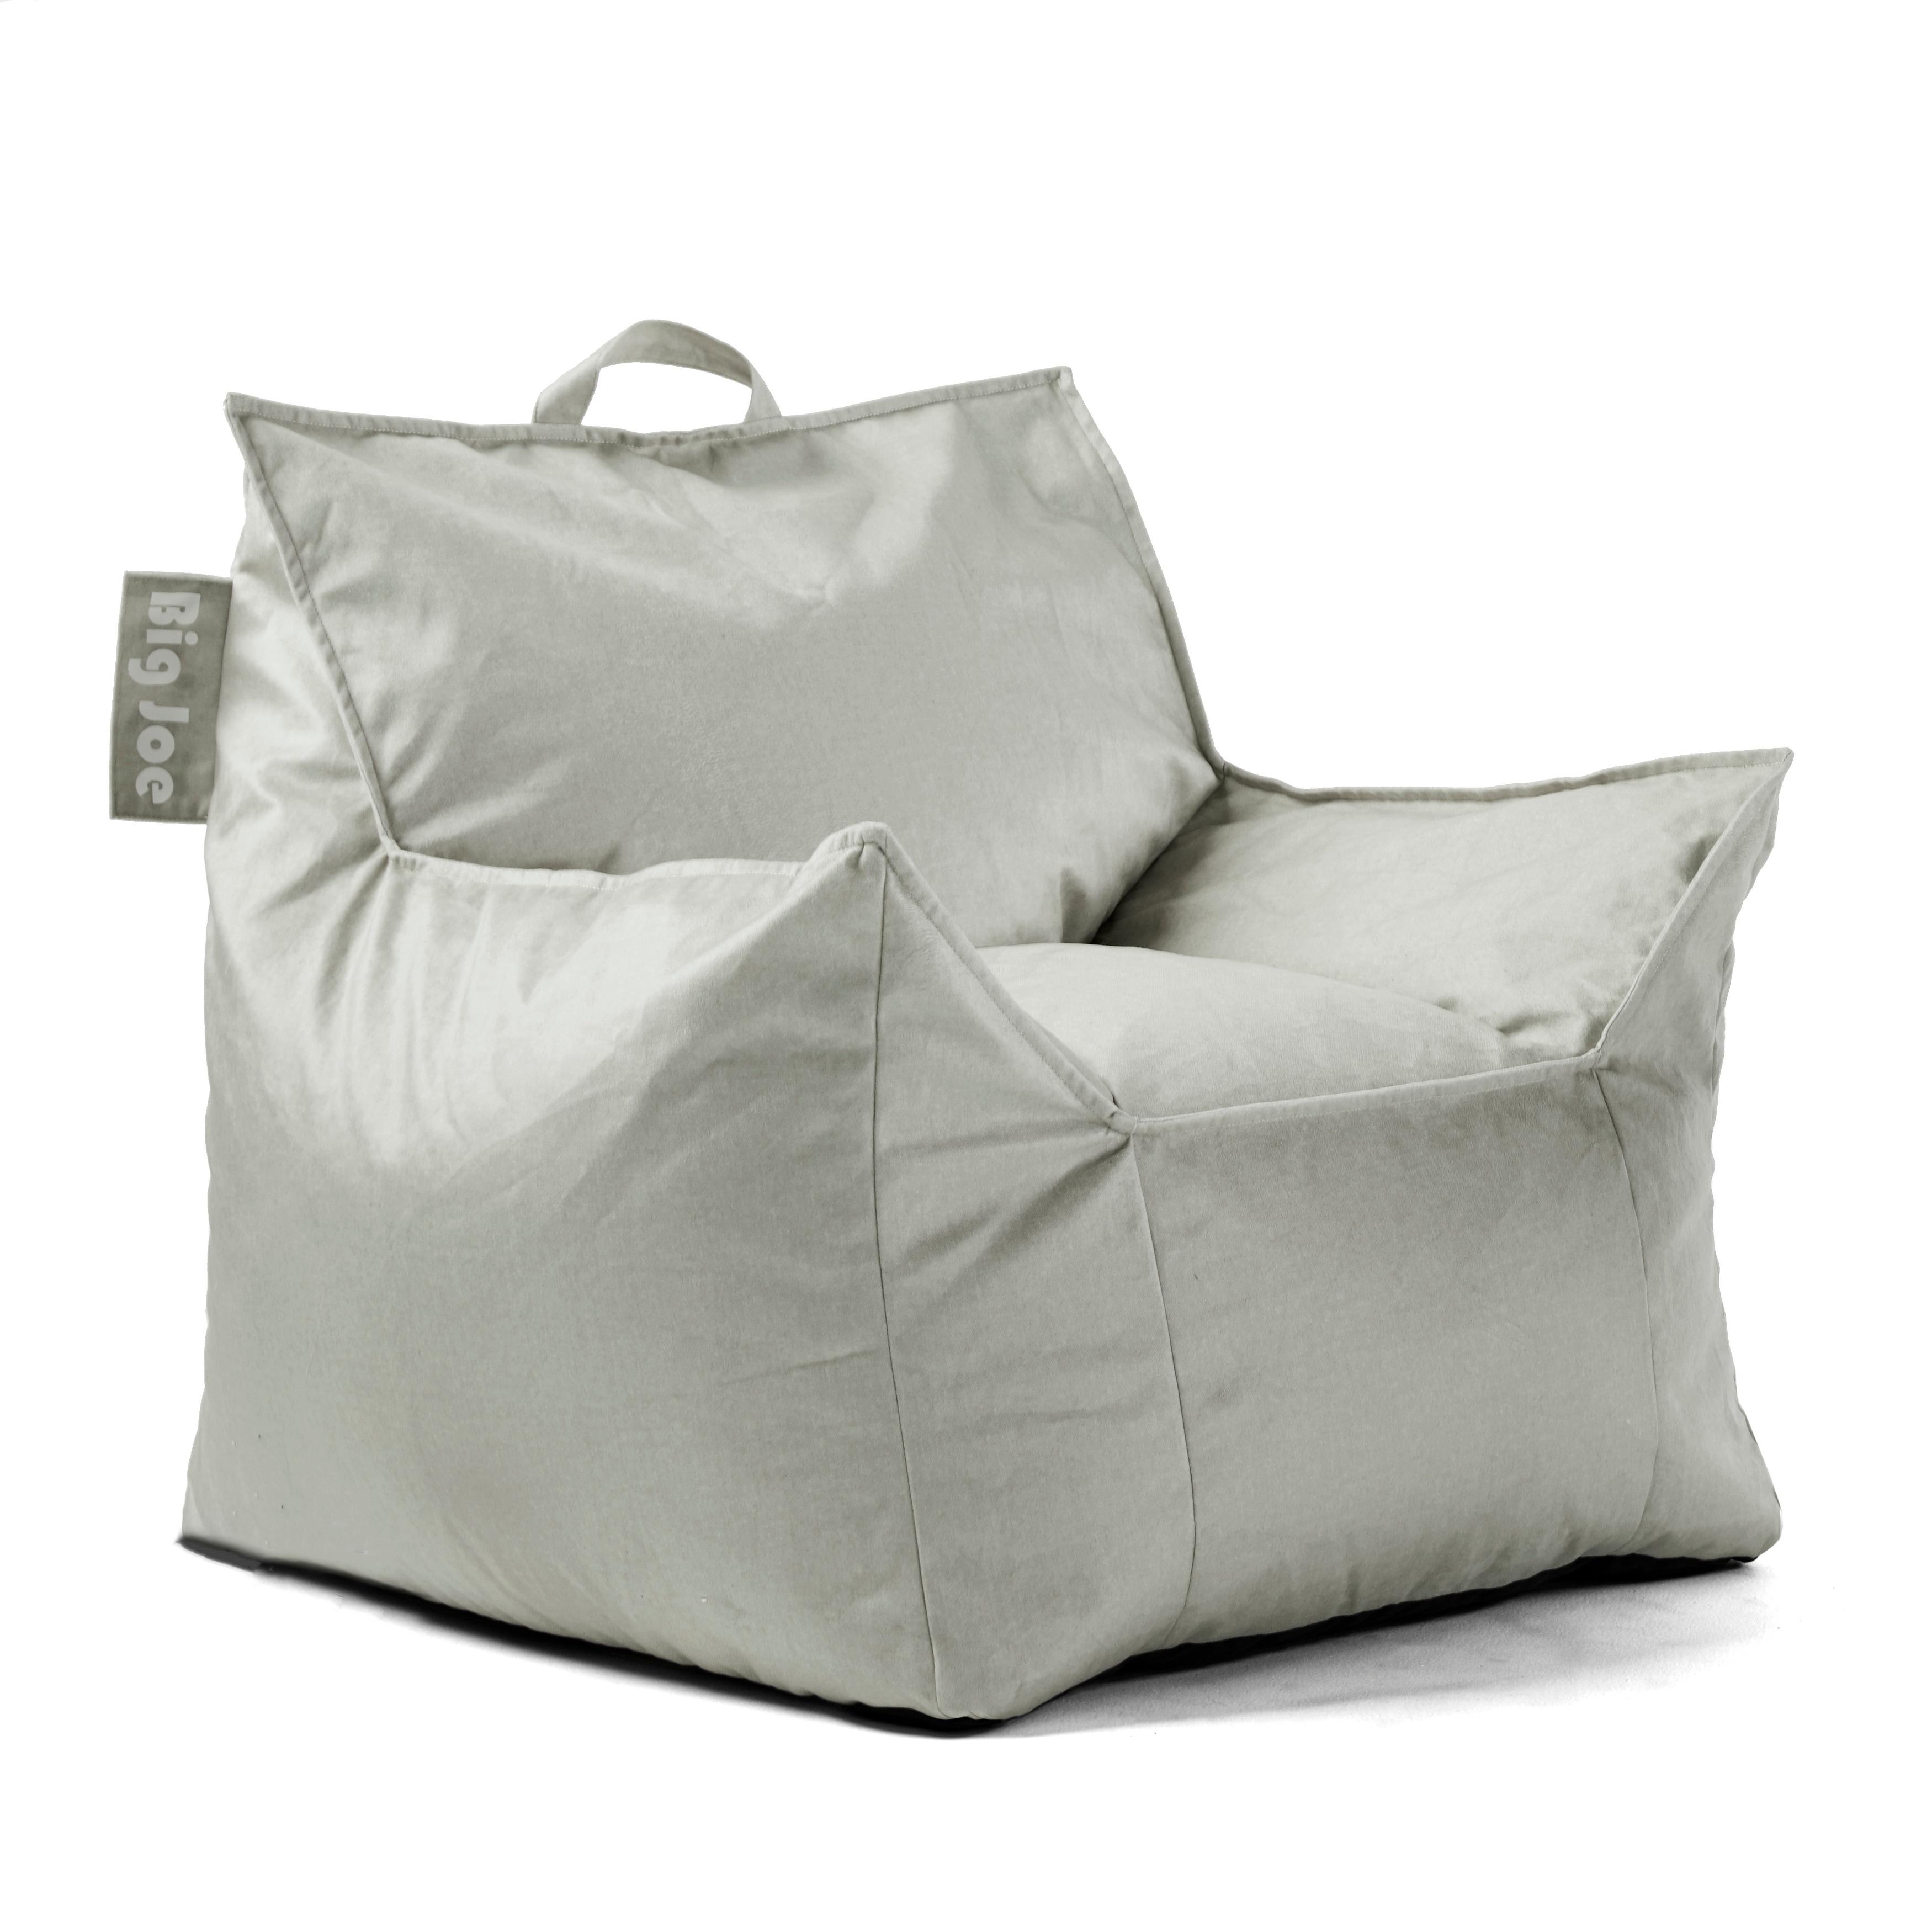 Shop Big Joe Mitten Bean Bag Chair   Free Shipping Today   Overstock.com    19759198